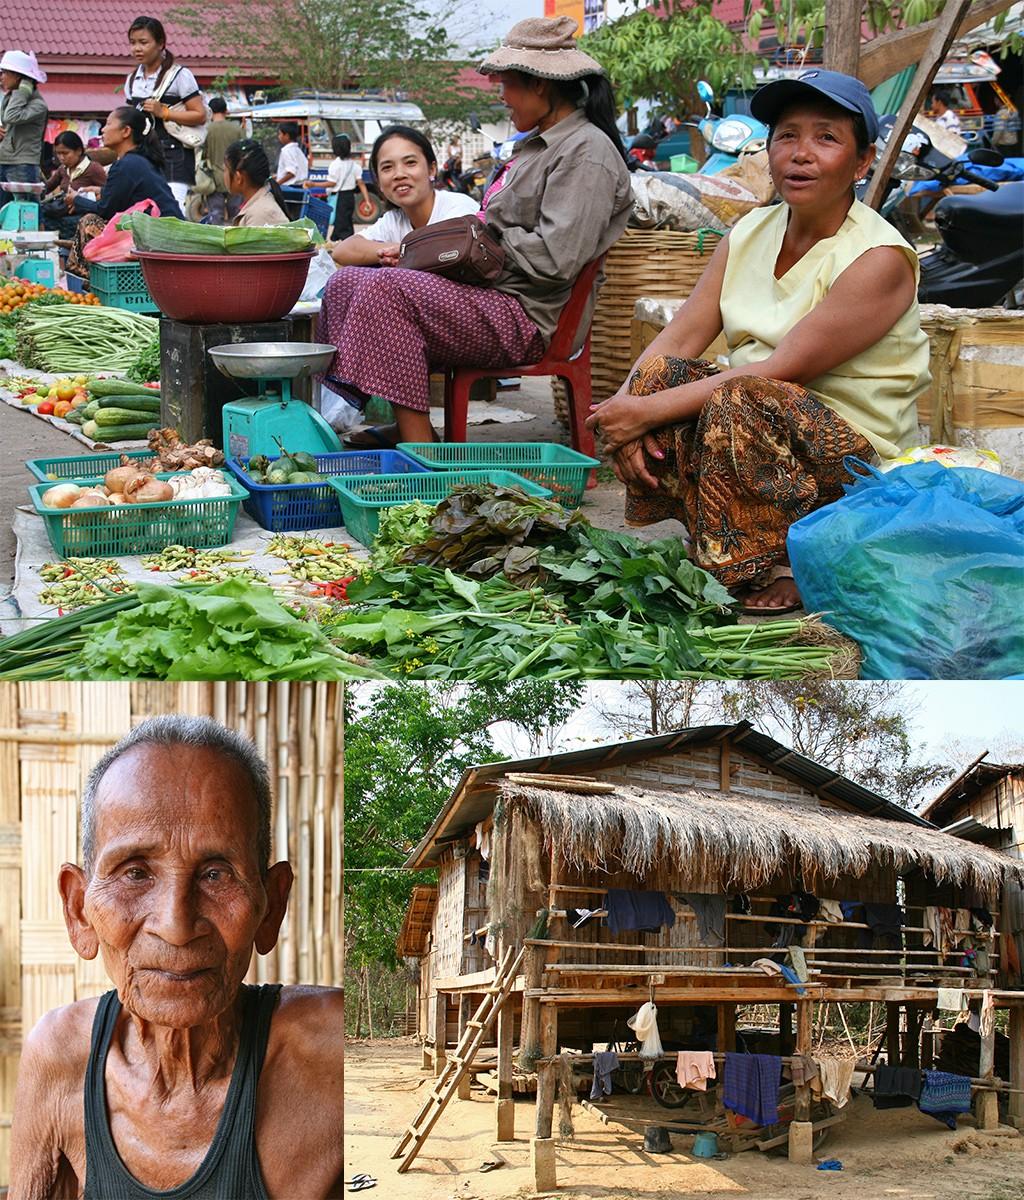 Sekong - Zuid-Oost Azië off the beaten track